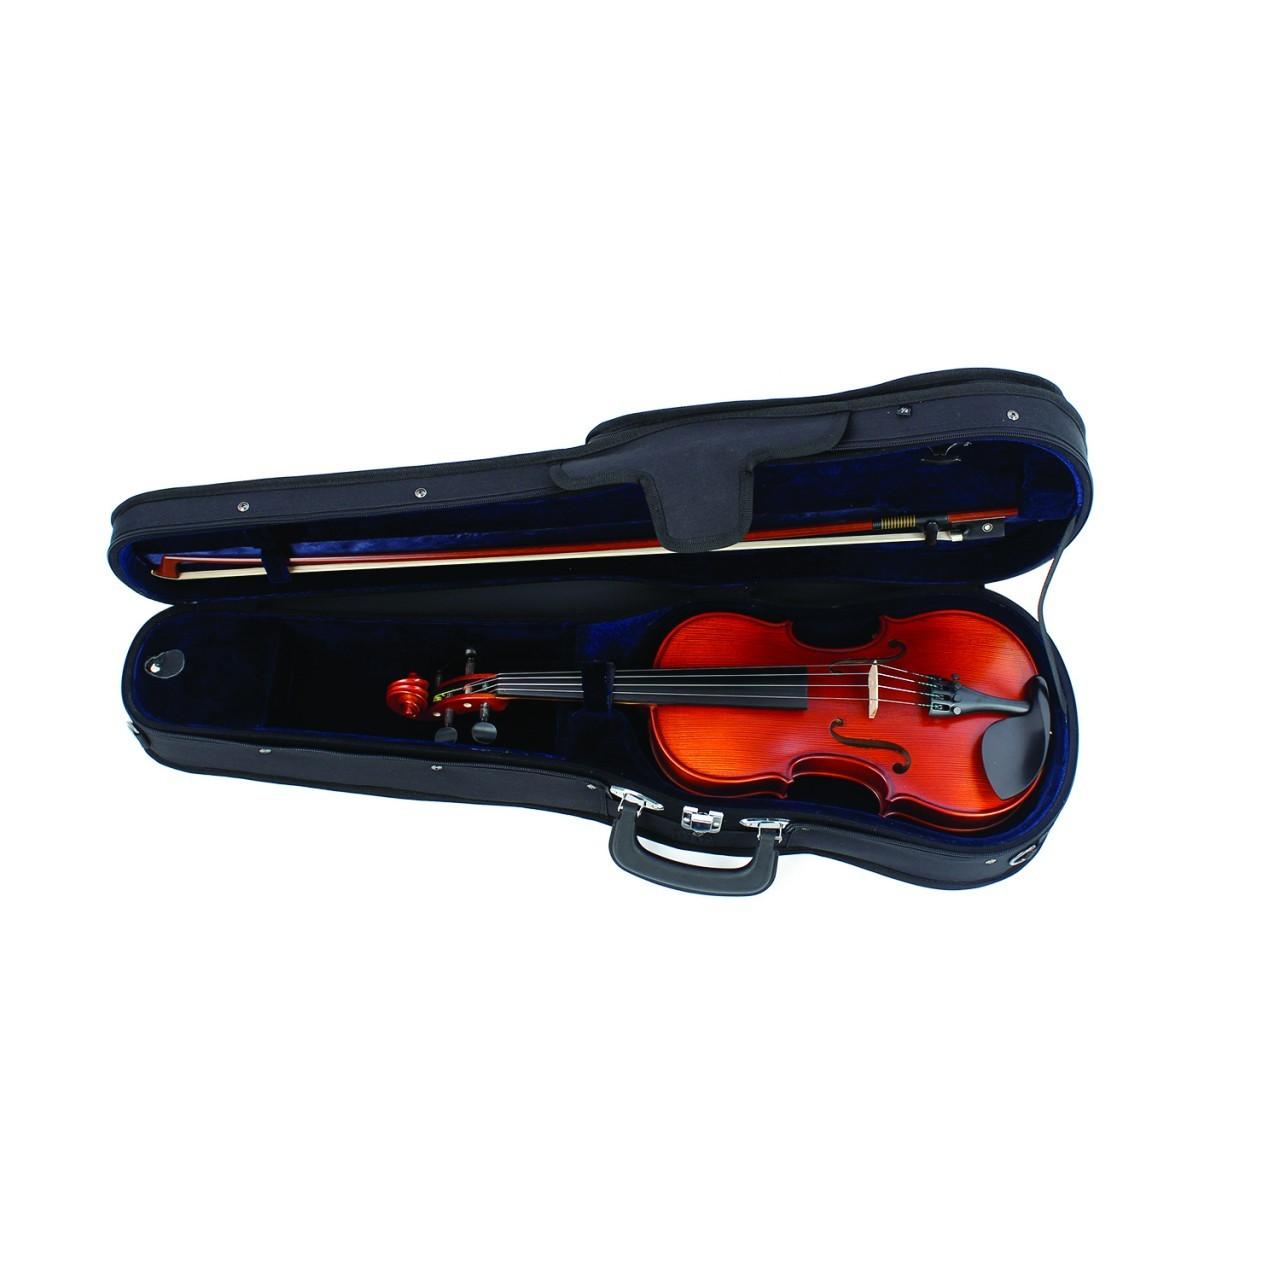 Höfner Violingarnitur II 4/4 golden handlackiert mit Etui + Bogen